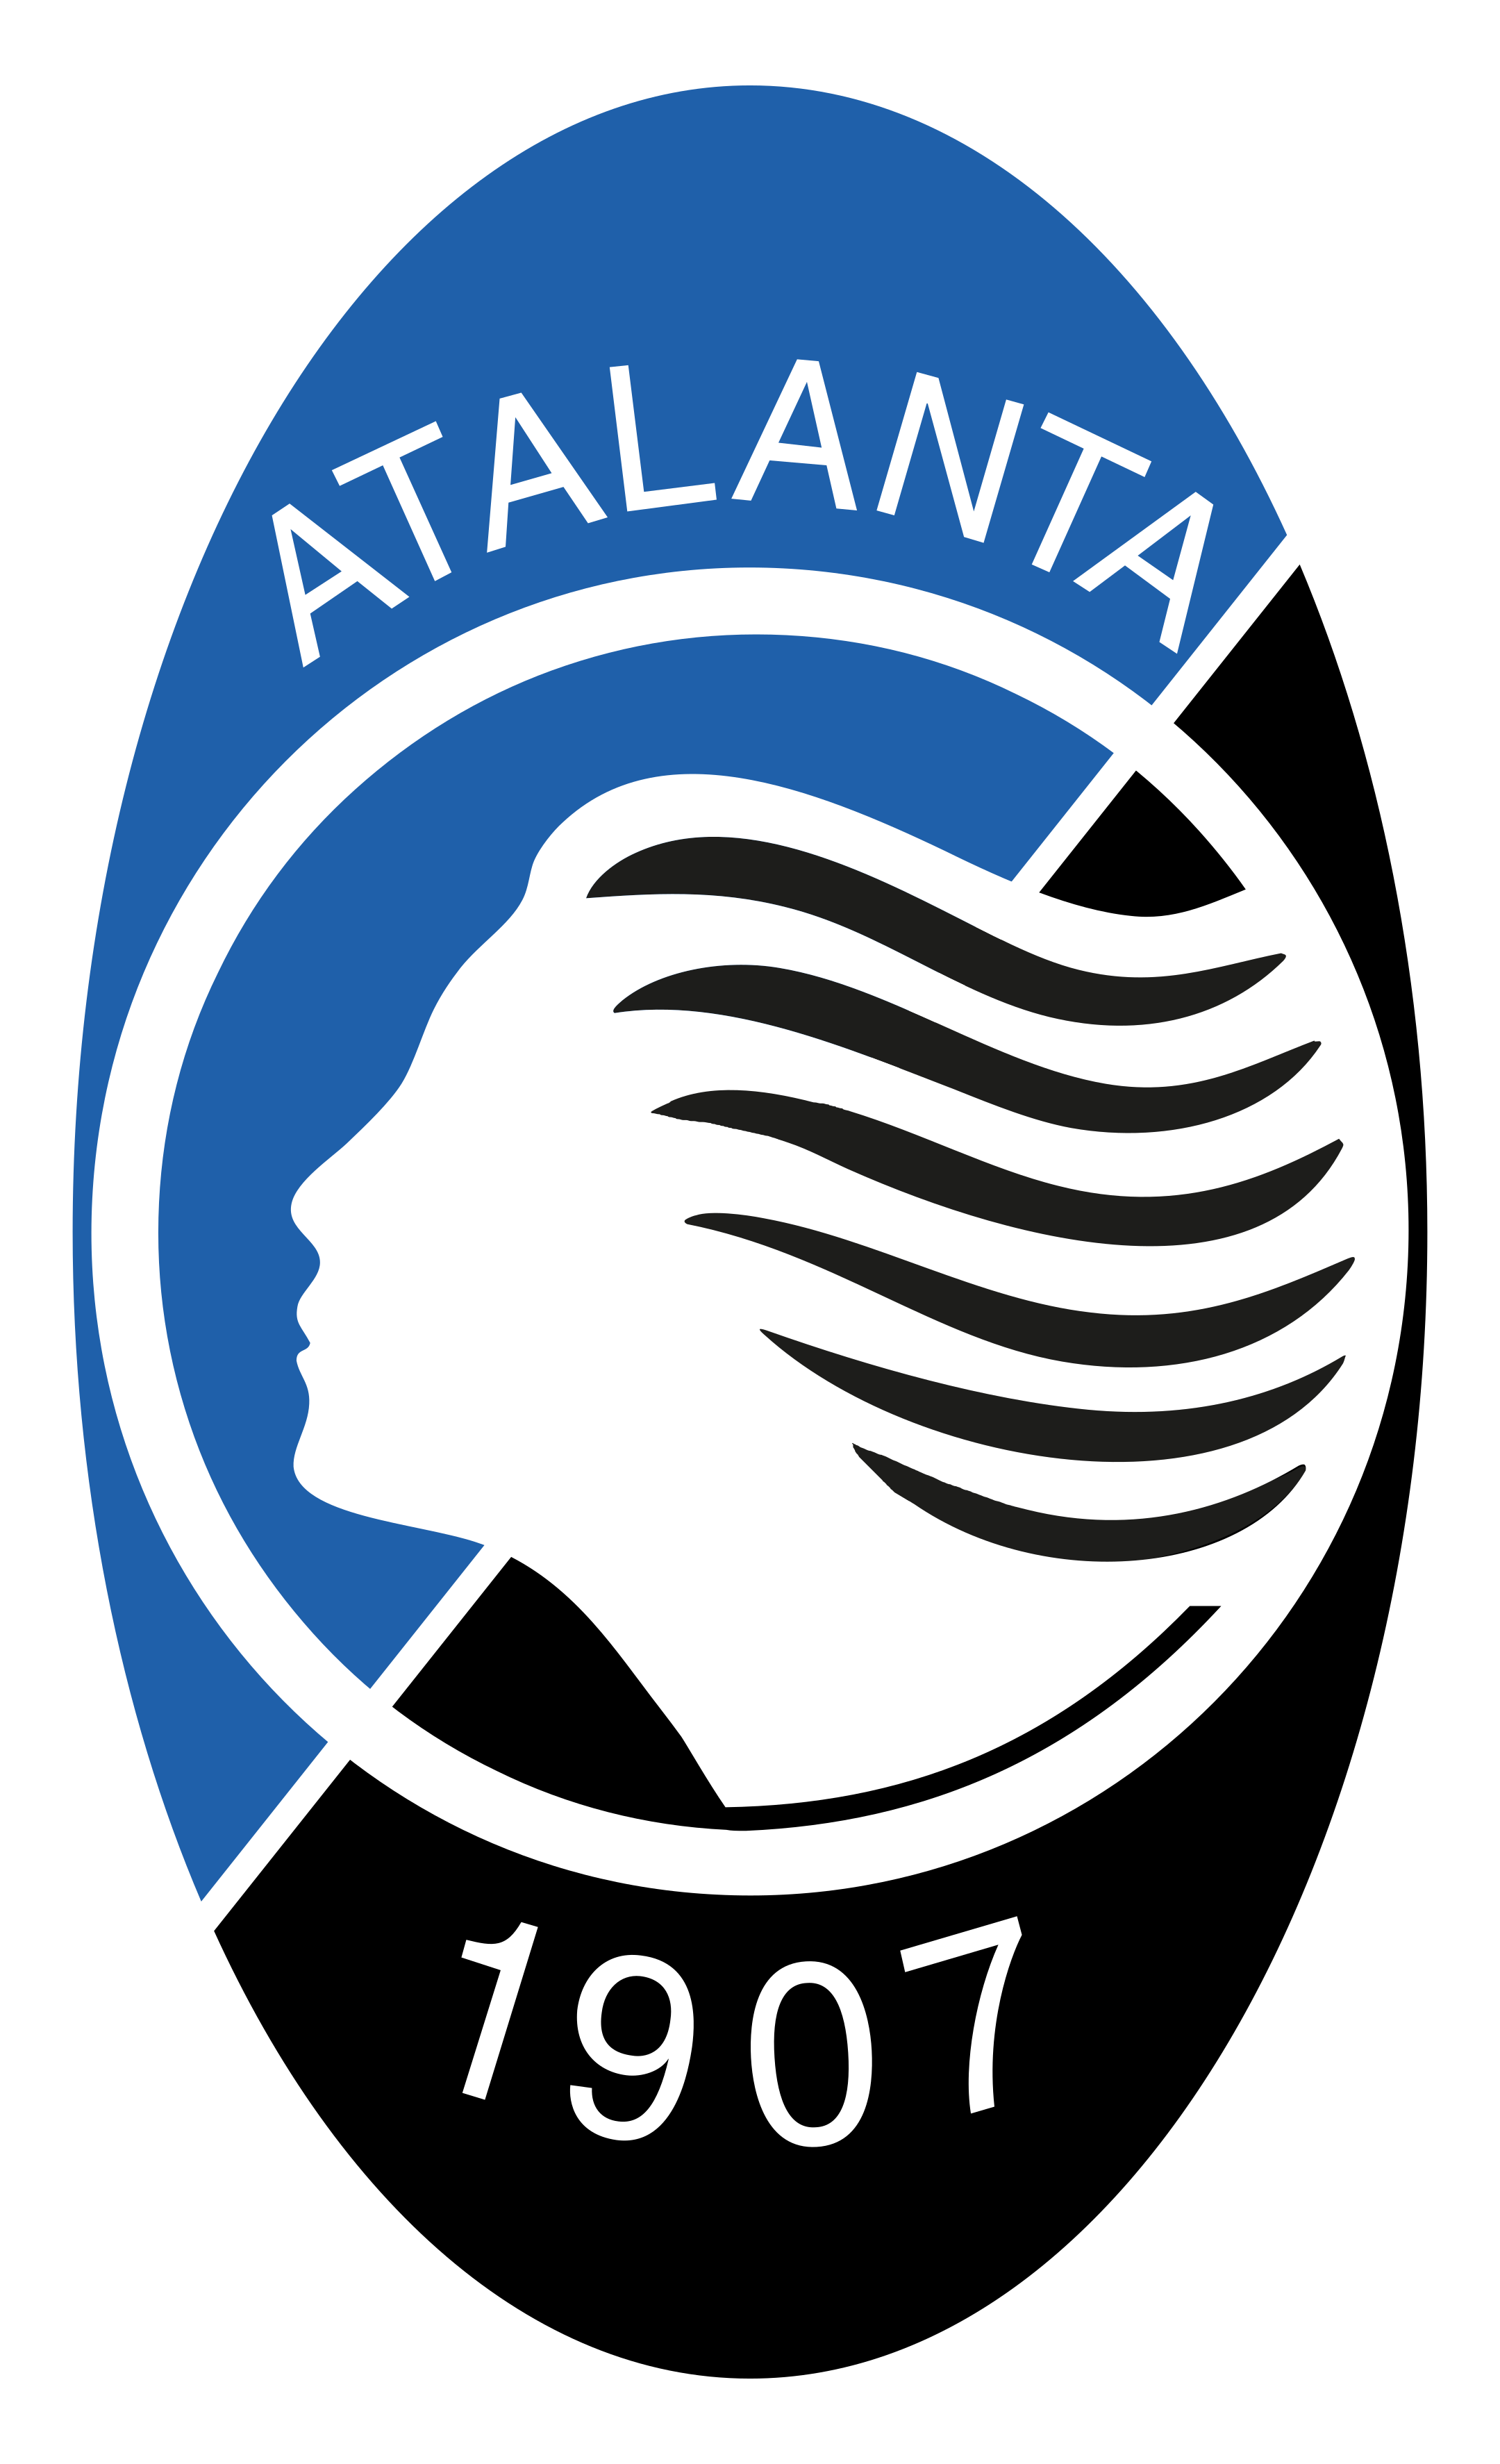 atalanta logo 1 - Atalanta BC Logo - Escudo